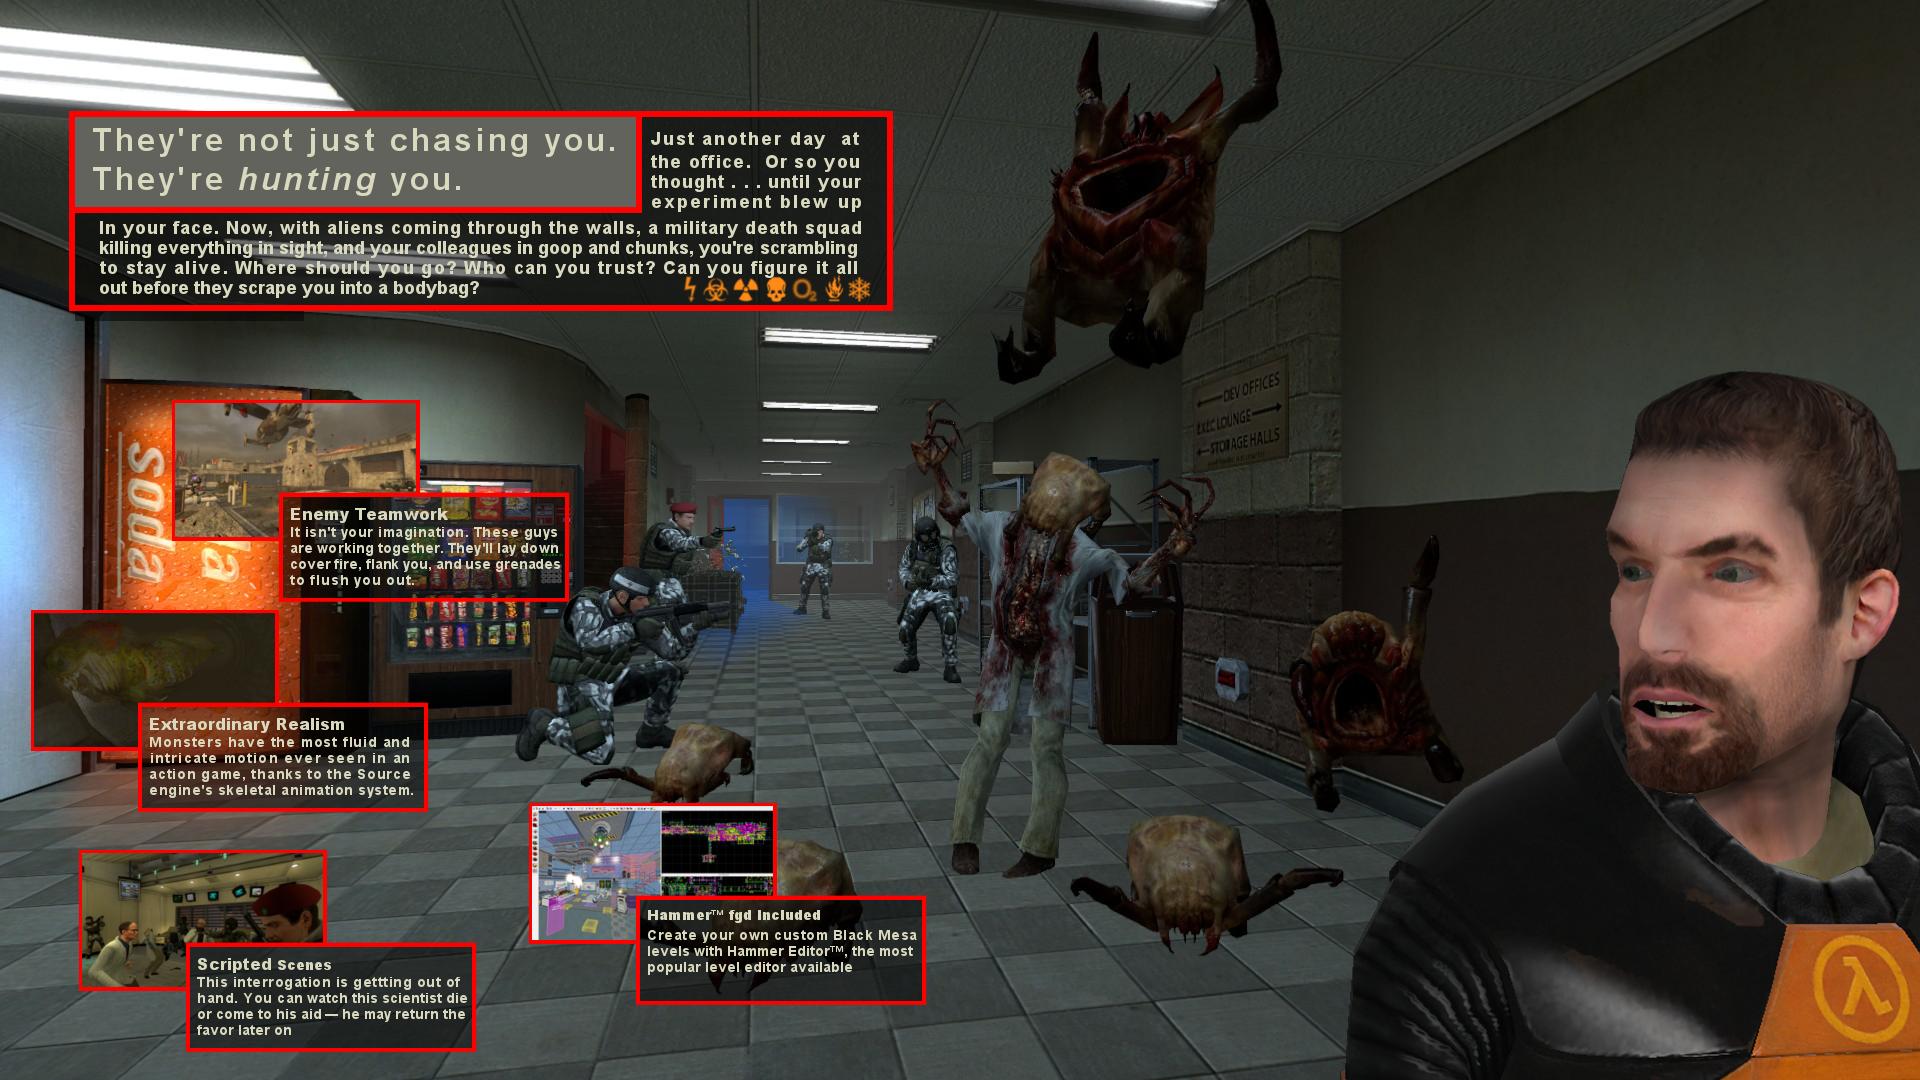 Red Dead Redemption Wallpaper Hd Black Mesa Wallpapers In Ultra Hd 4k Gameranx